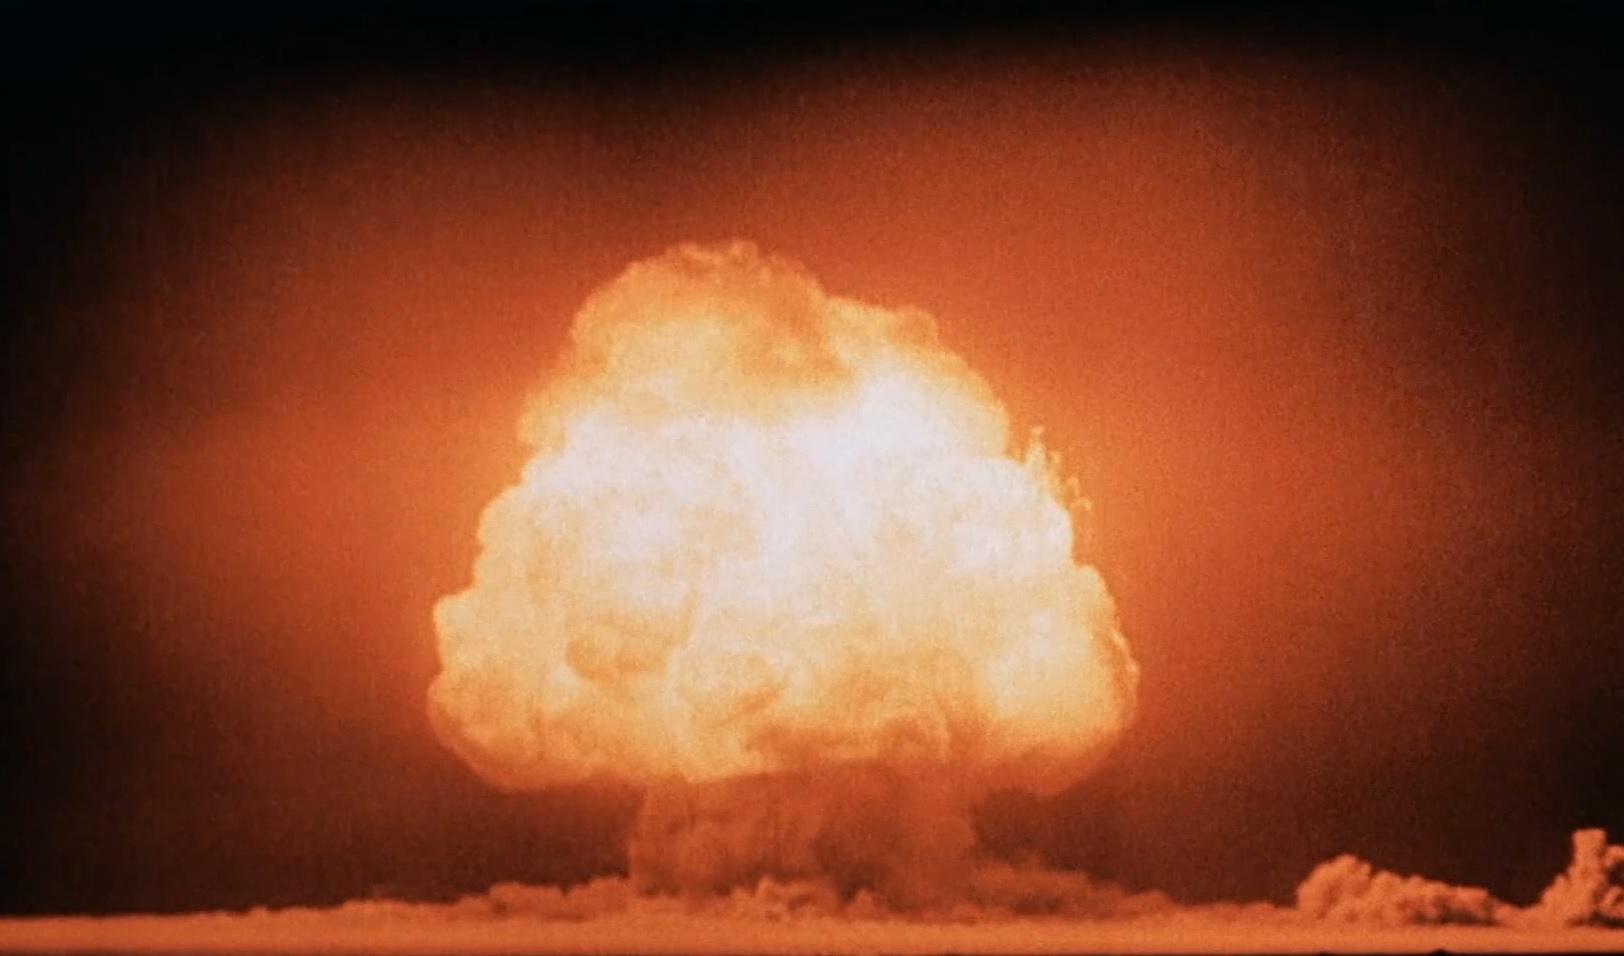 "<p>Грибовидное облако через несколько секунд после детонации первой атомной бомбы на полигоне Аламогордо, 16 июля 1945 года.<em style=""font-style: italic;""> </em>Фото © <a href=""https://ru.wikipedia.org/wiki/%D0%A2%D1%80%D0%B8%D0%BD%D0%B8%D1%82%D0%B8_(%D0%B8%D1%81%D0%BF%D1%8B%D1%82%D0%B0%D0%BD%D0%B8%D0%B5)"" target=""_blank"" rel=""noopener noreferrer"">Wikipedia</a></p>"